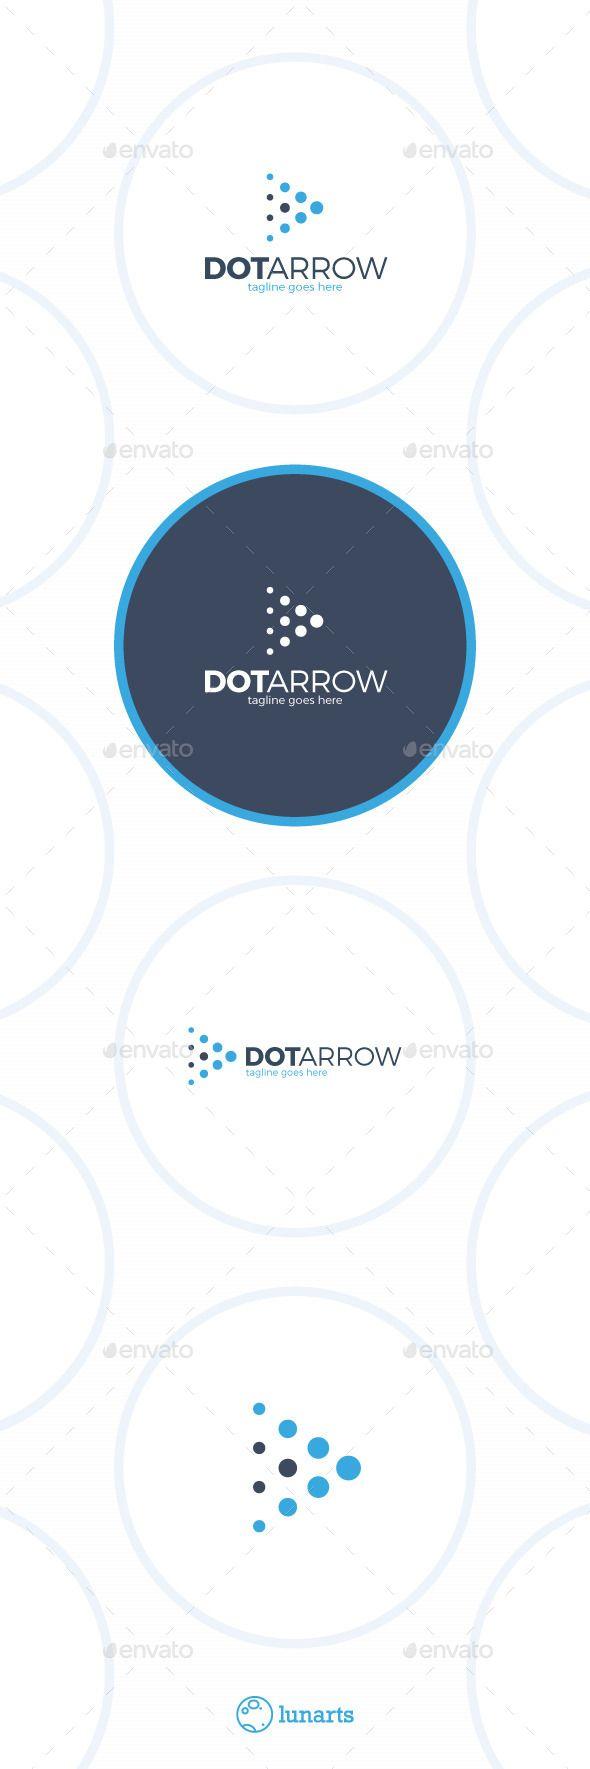 Arrow Dot  - Play Logo Design Template Vector #logotype Download it here: http://graphicriver.net/item/arrow-dot-logo-play/12899700?s_rank=514?ref=nexion